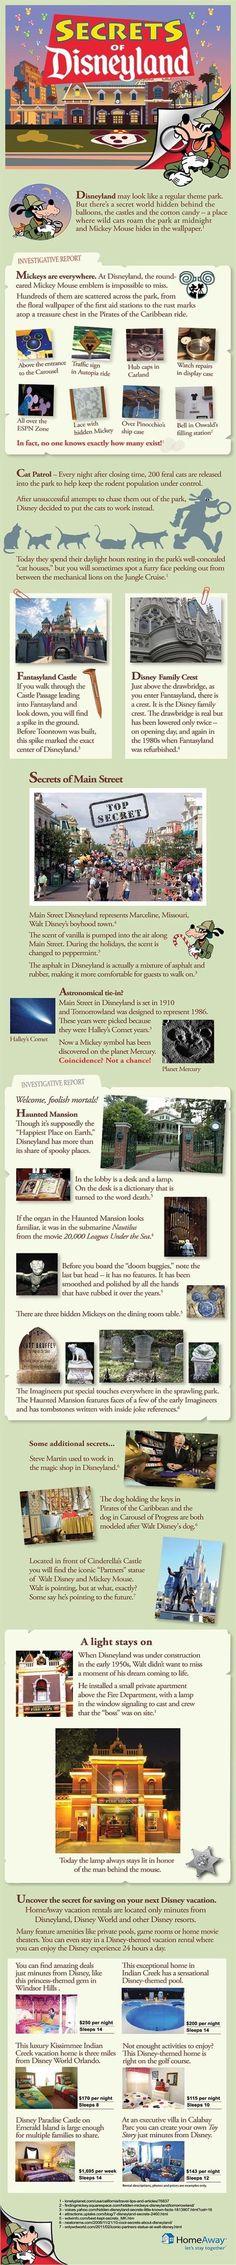 one day, secret infograph, disneyland trip, disney secrets, place, disneyland secrets, feral cats, thing, kid